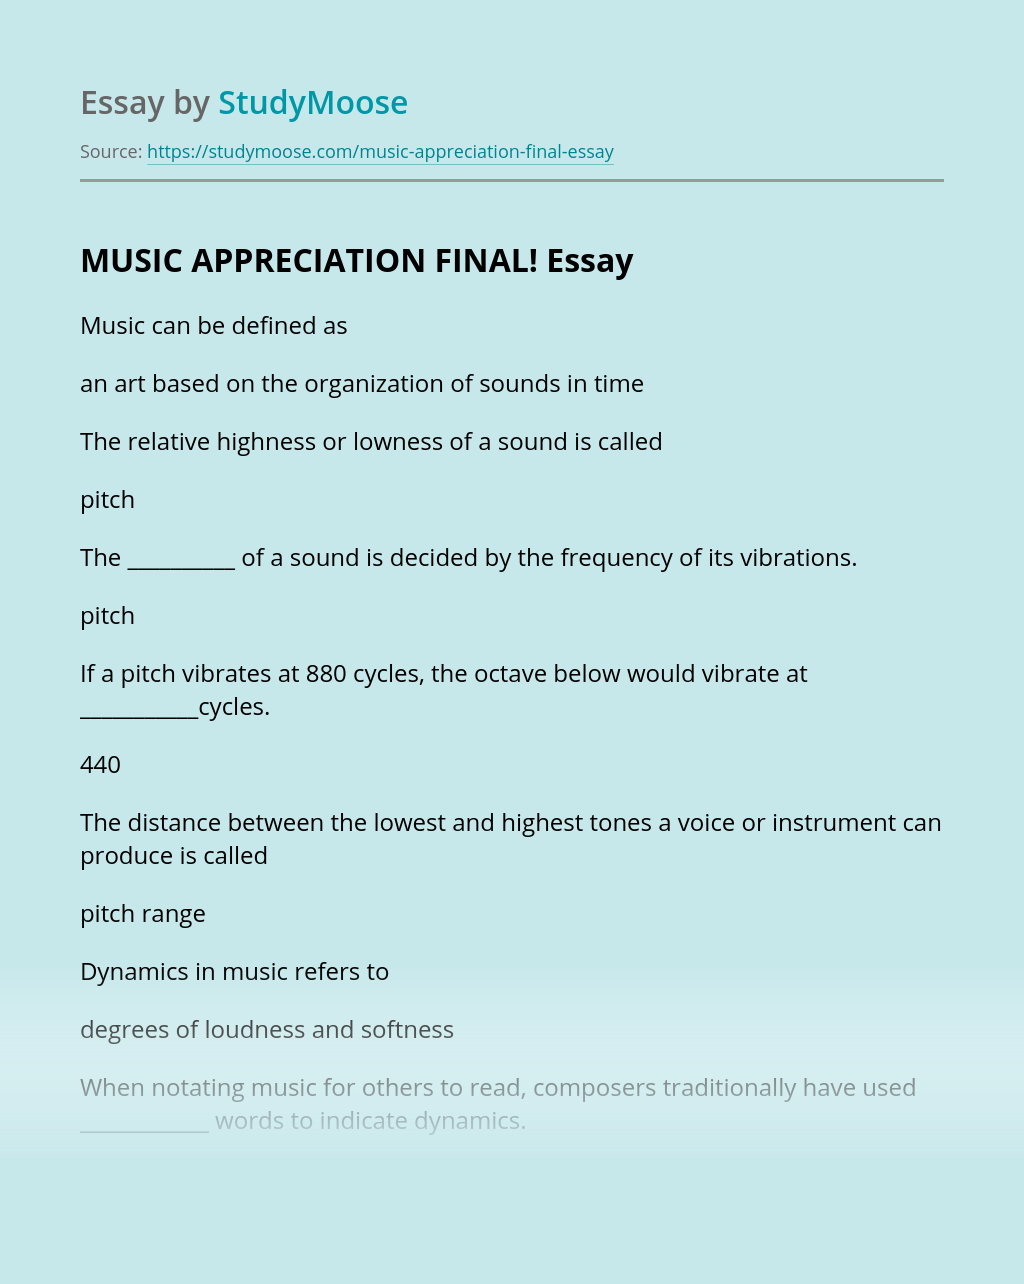 MUSIC APPRECIATION FINAL!